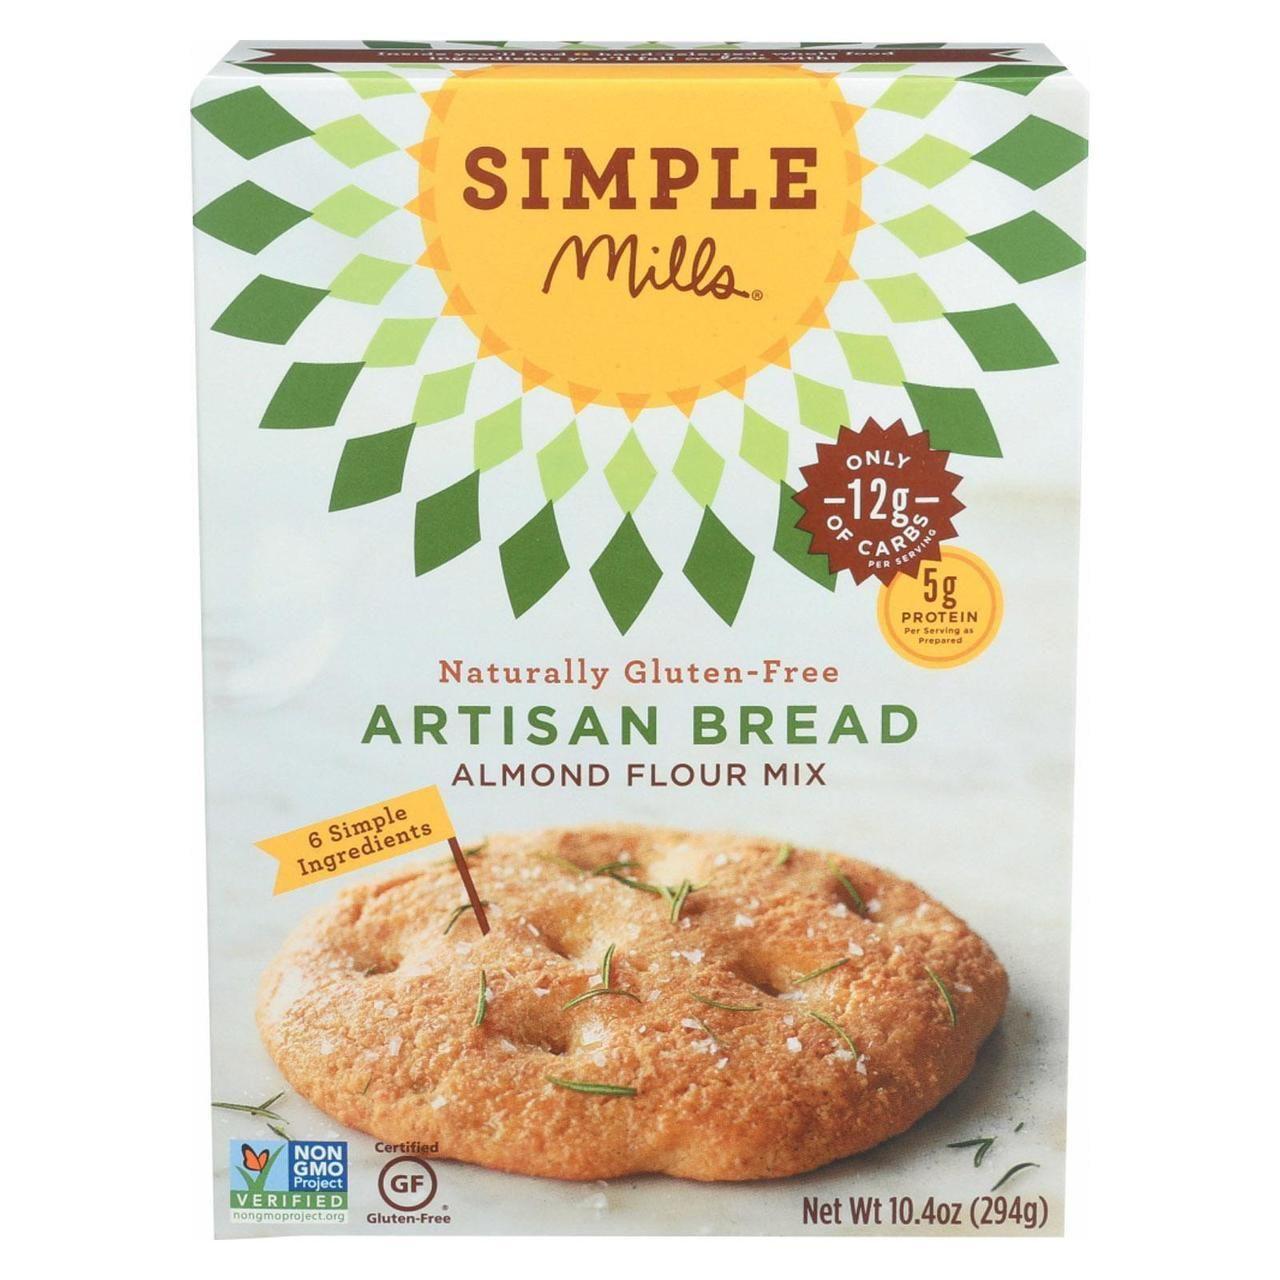 Simple mills almond flour artisan bread mix case of 6